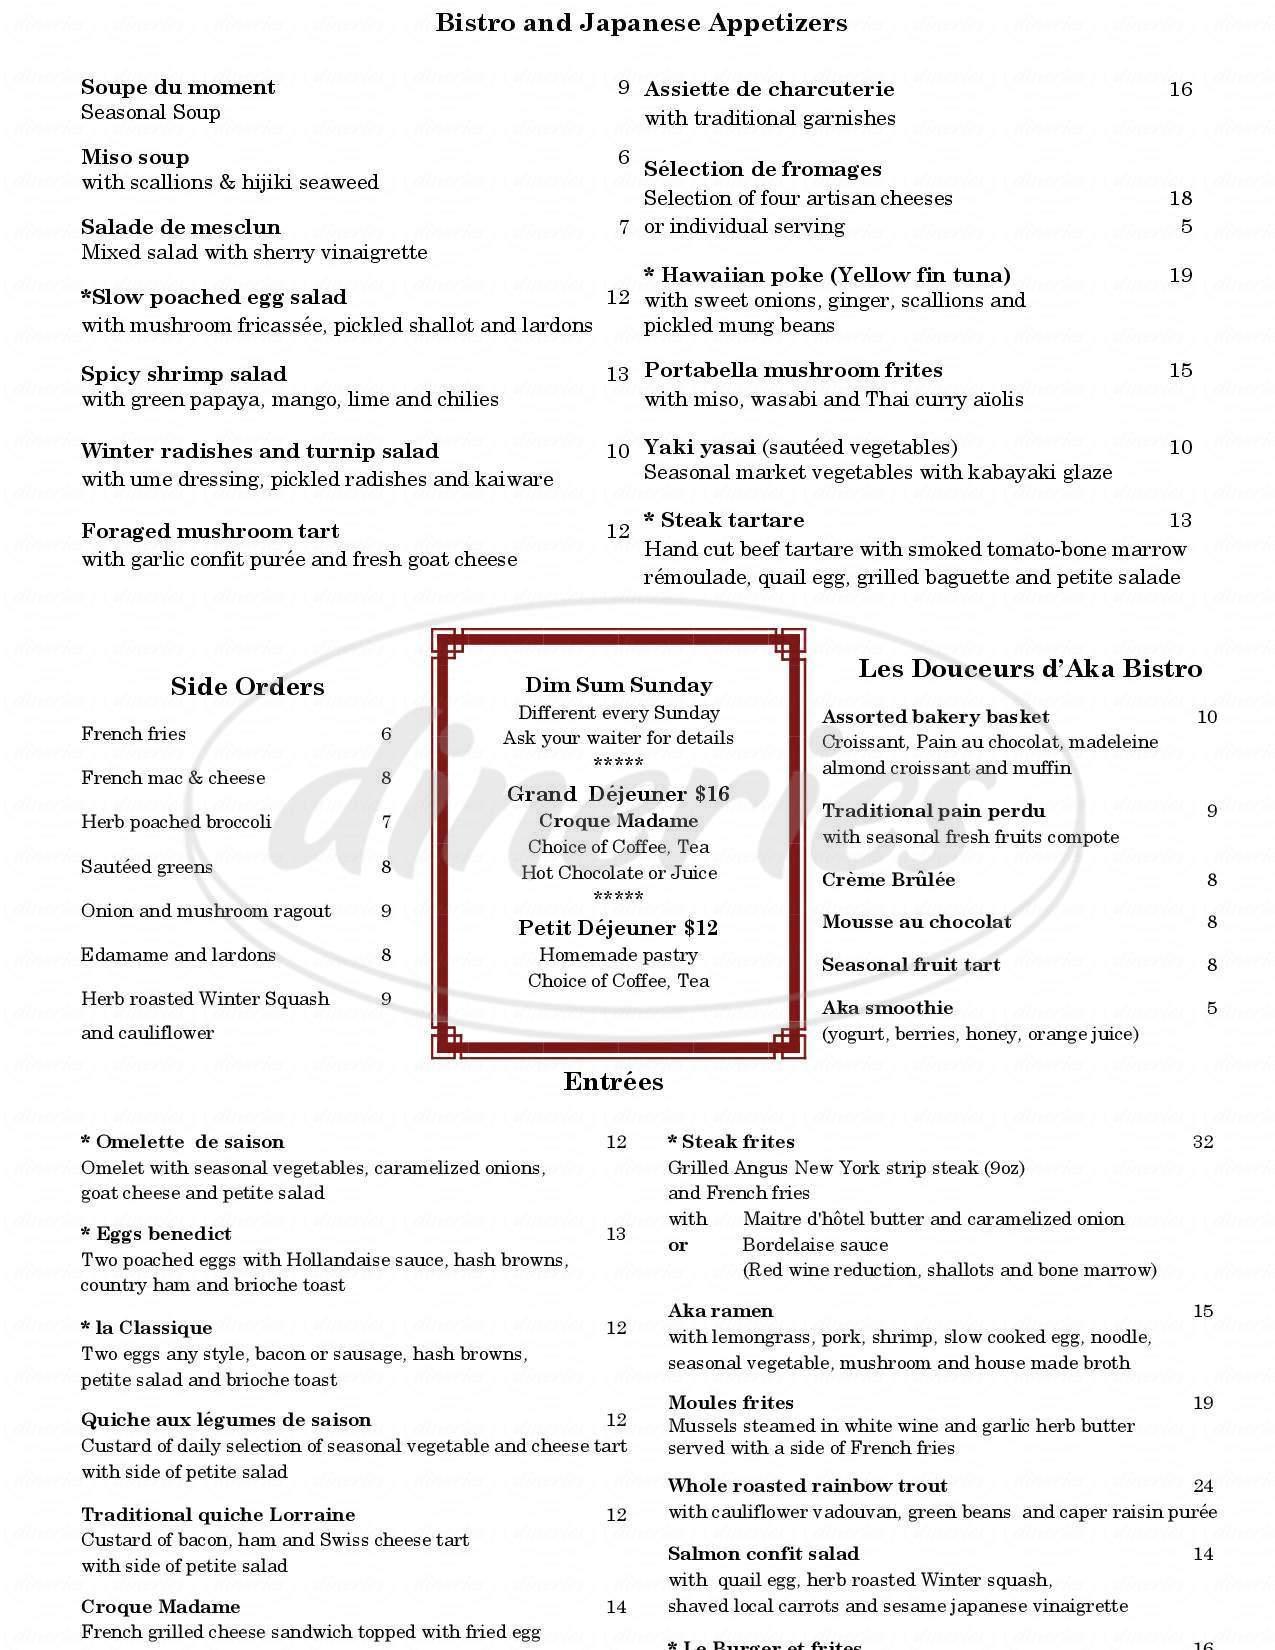 menu for AKA Bistro